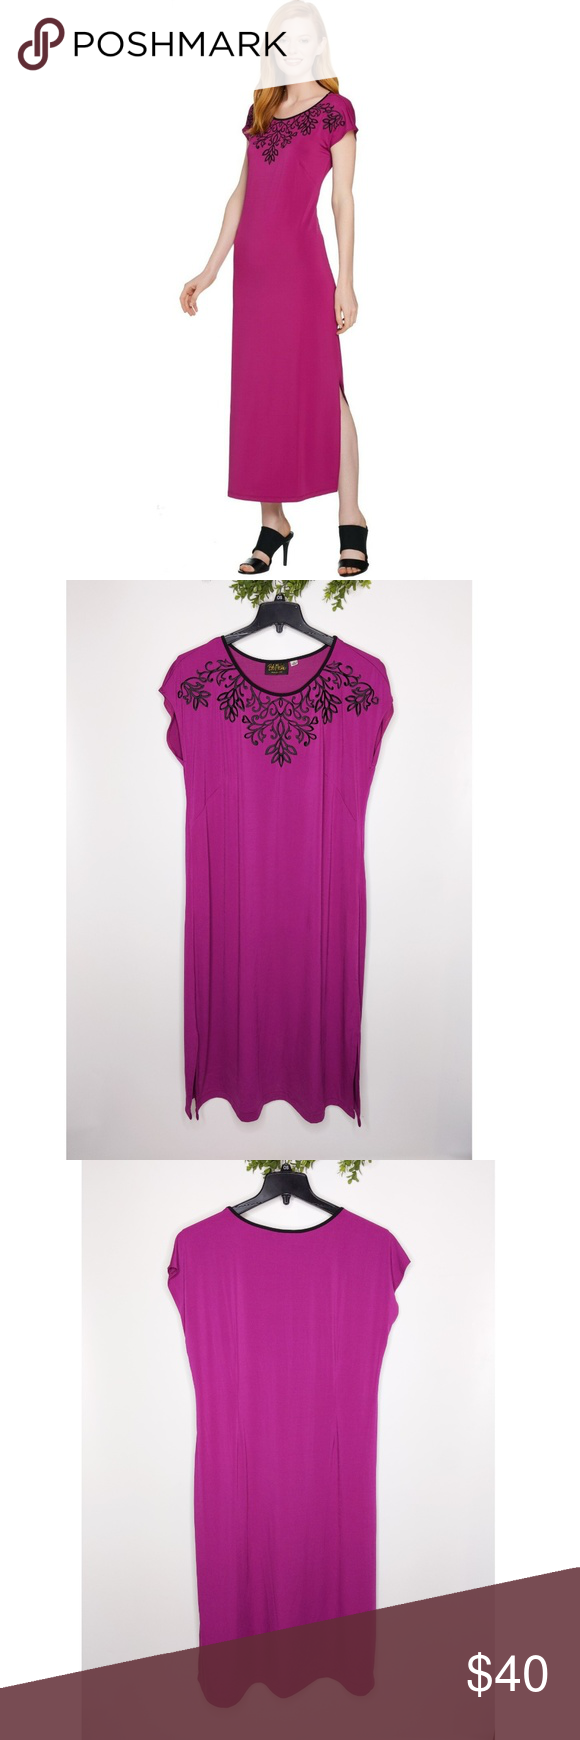 Bob Mackie Maxi Dress 1x Embroidered Dolman Sleeve Dresses Maxi Dress Maxi Styles [ 1740 x 580 Pixel ]